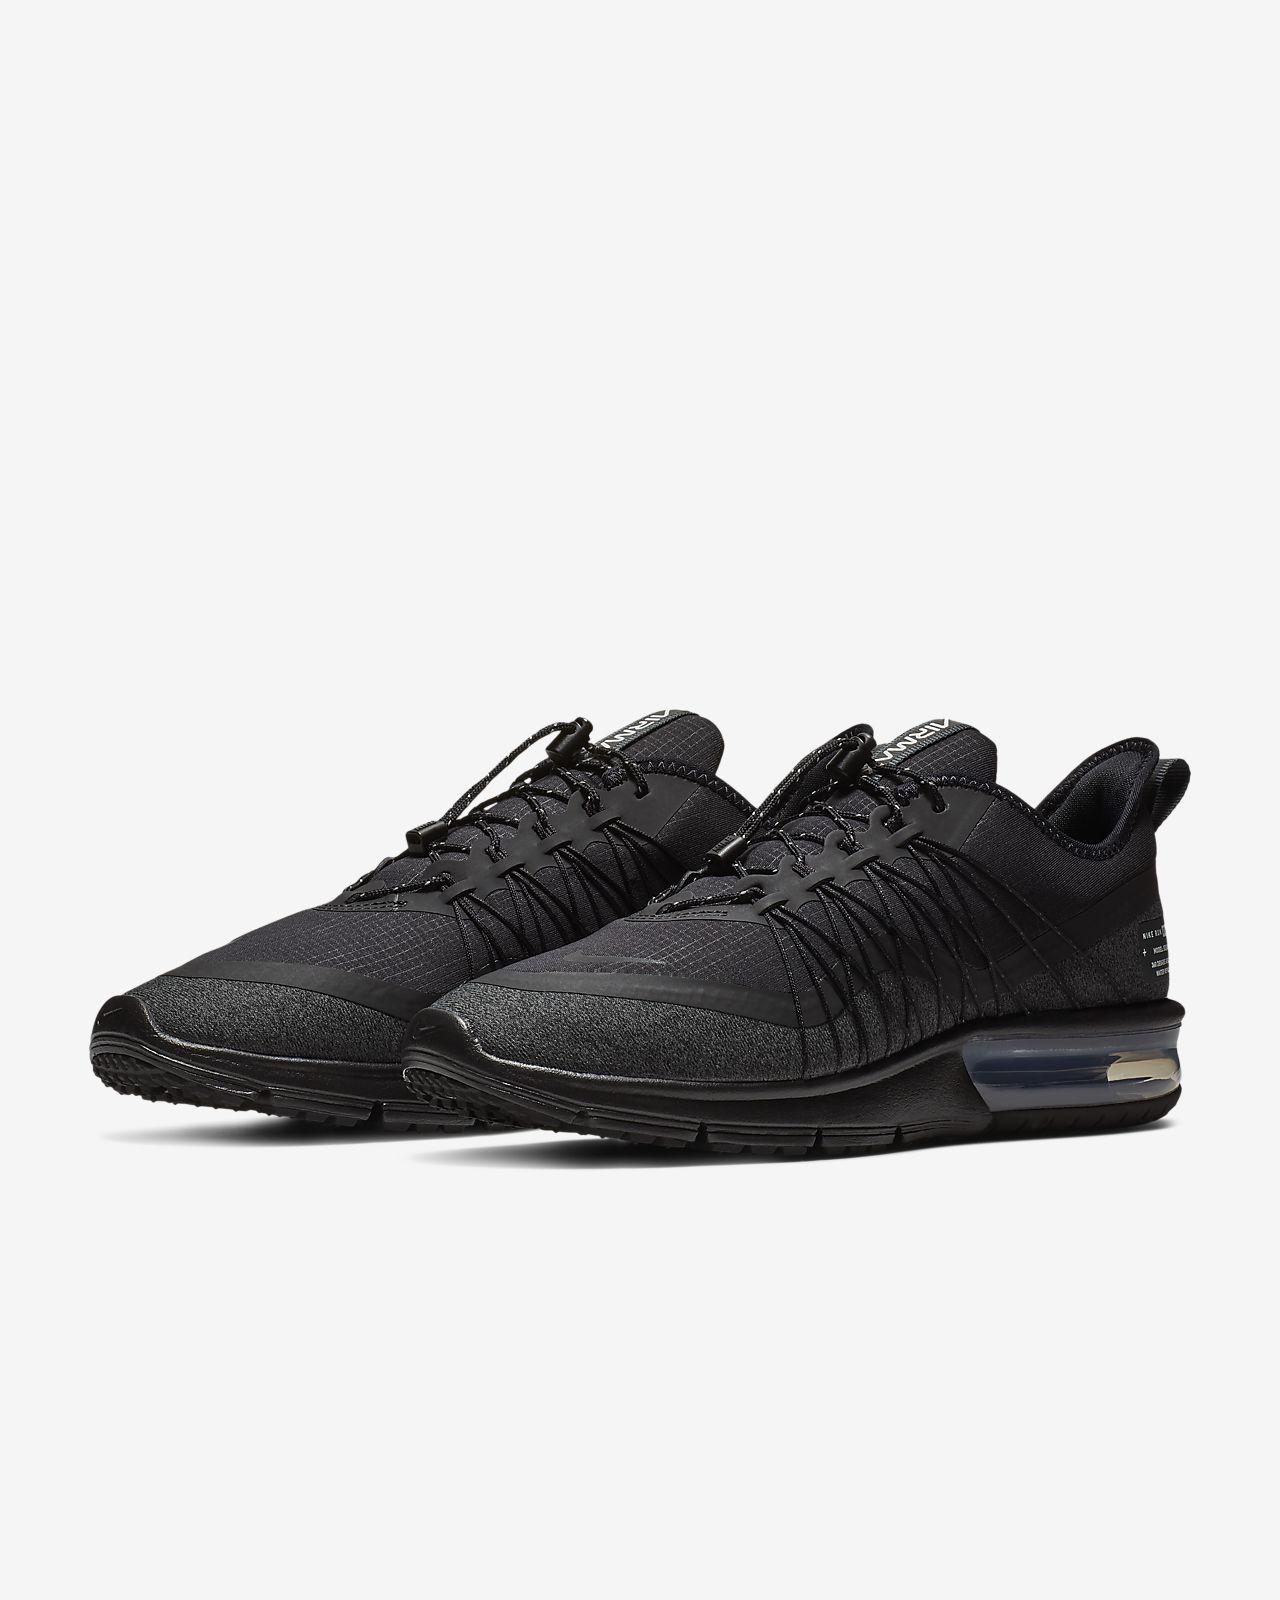 best sneakers fa6e1 0667d Pour Utility Air Max Nike 4 Chaussure Sequent Femme Lu 4YRwSq